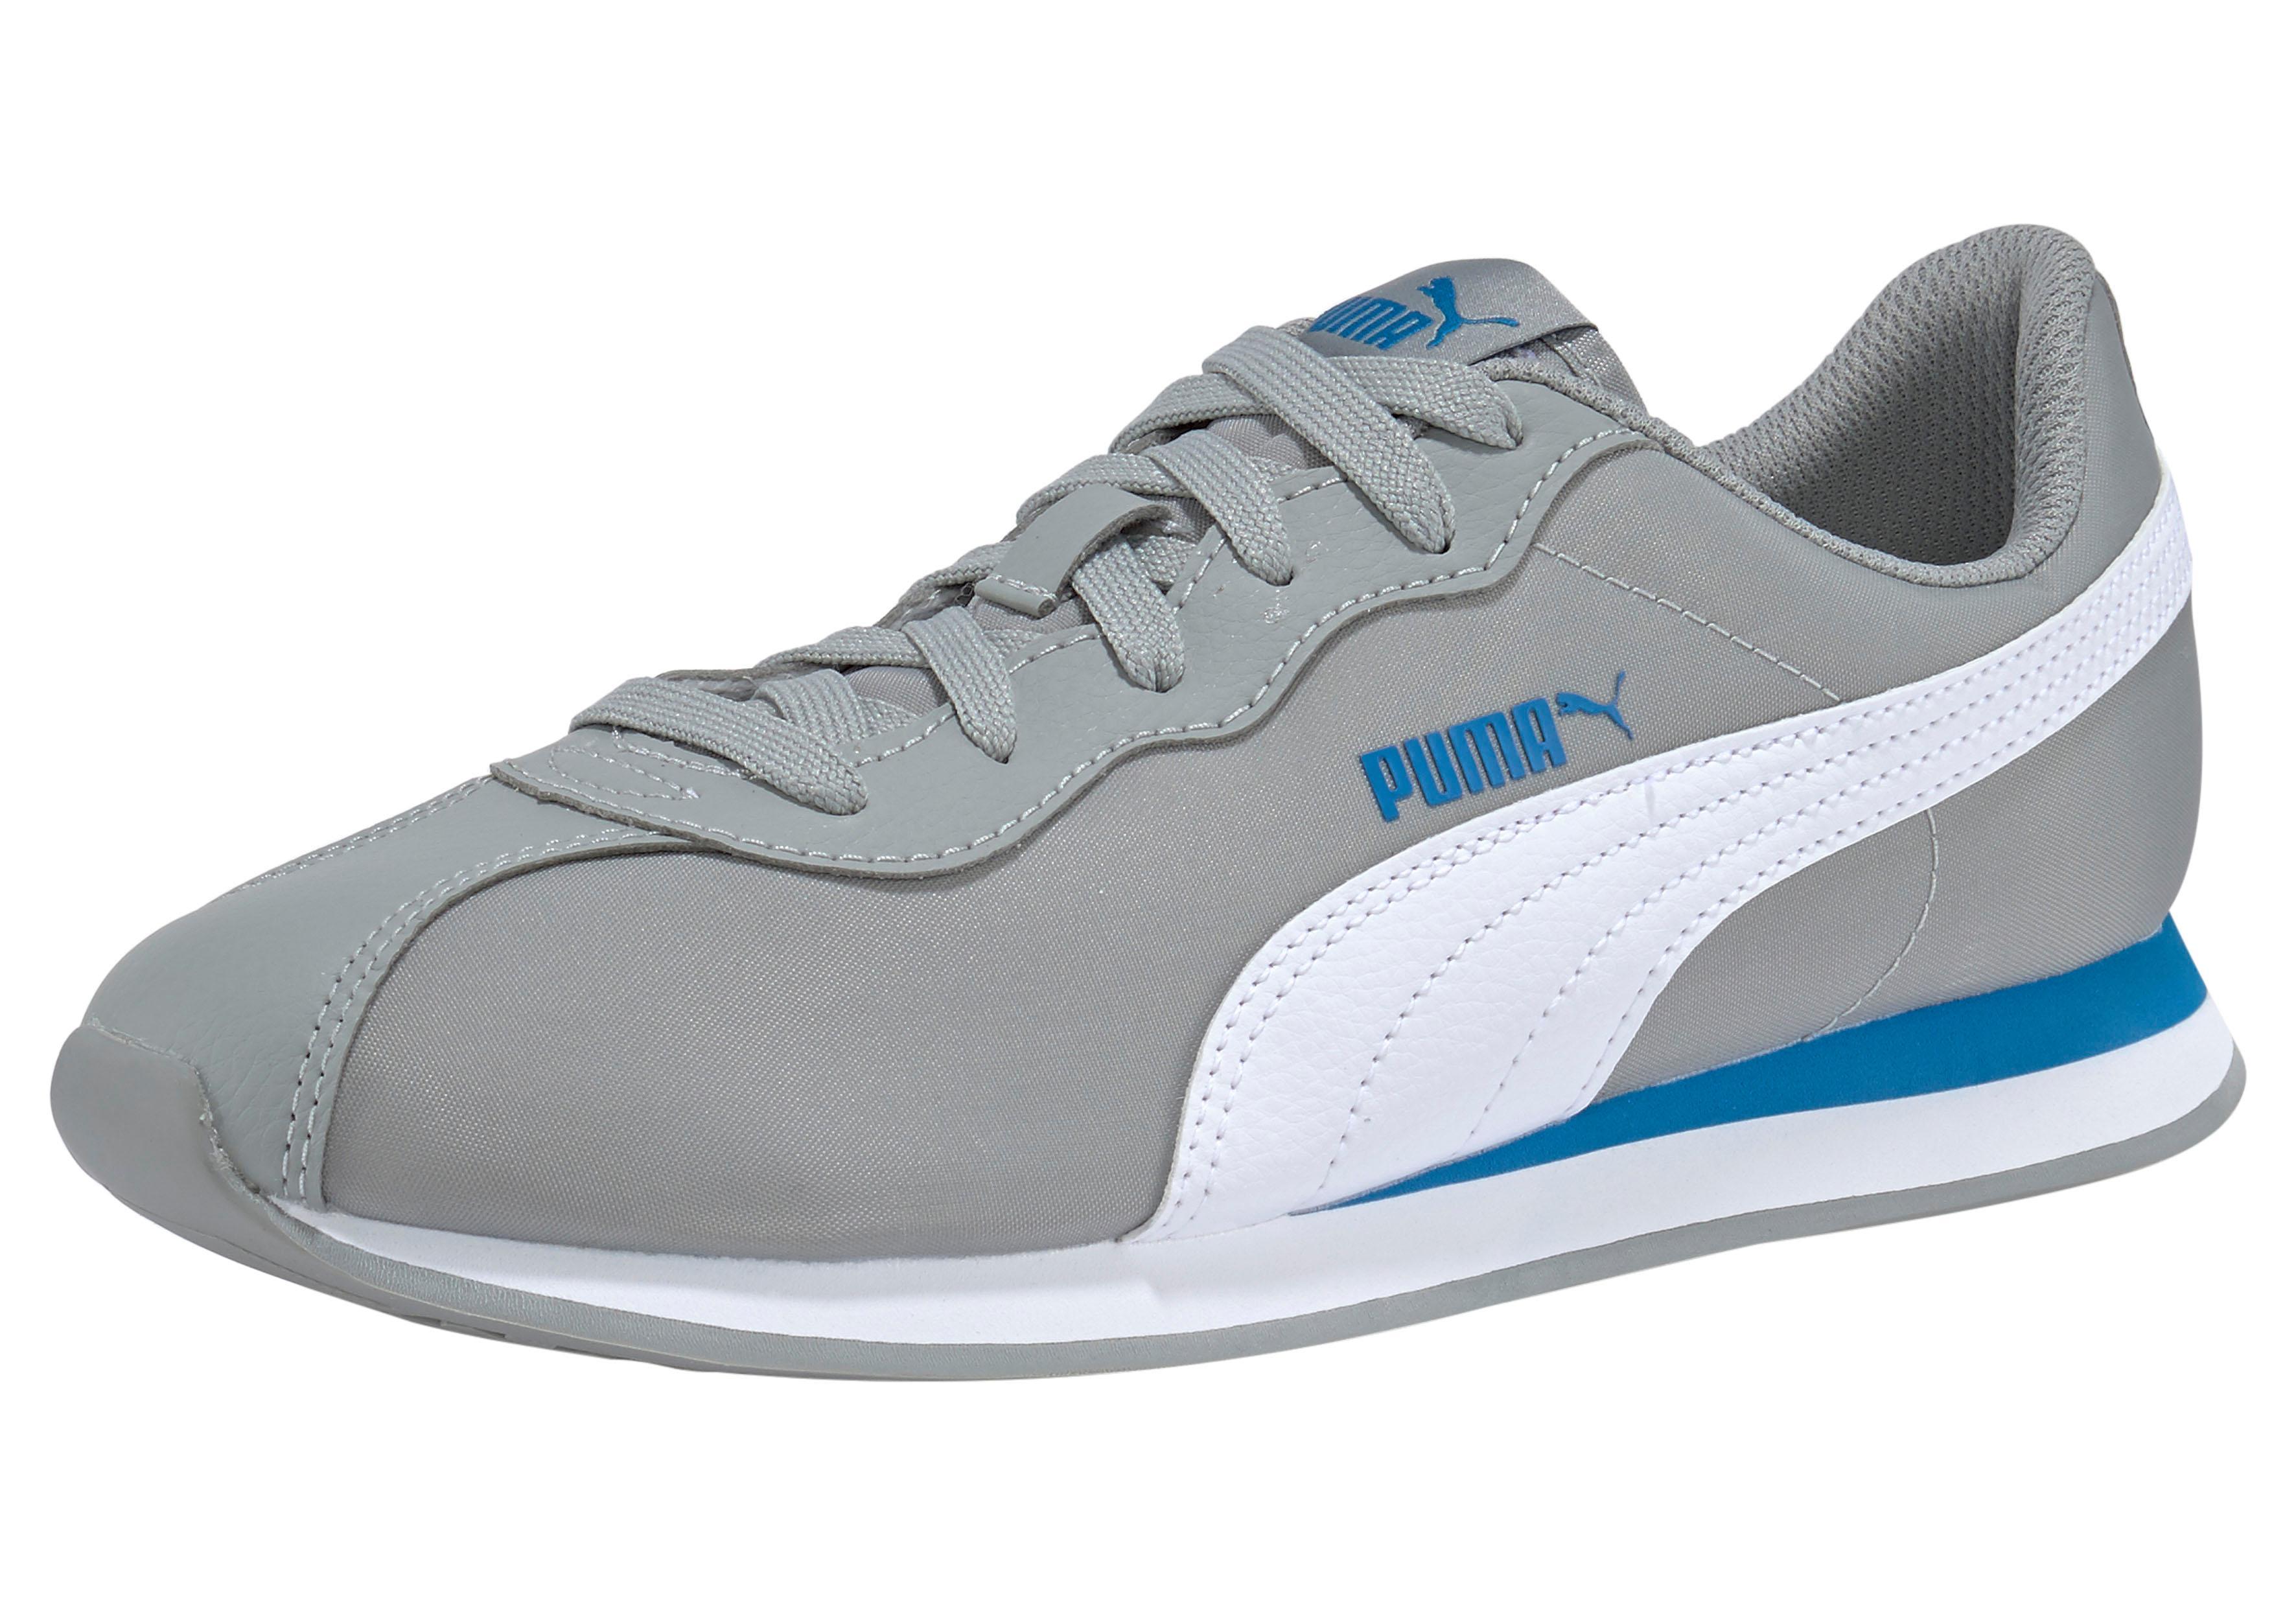 puma -  Sneaker Turin II NL Wns